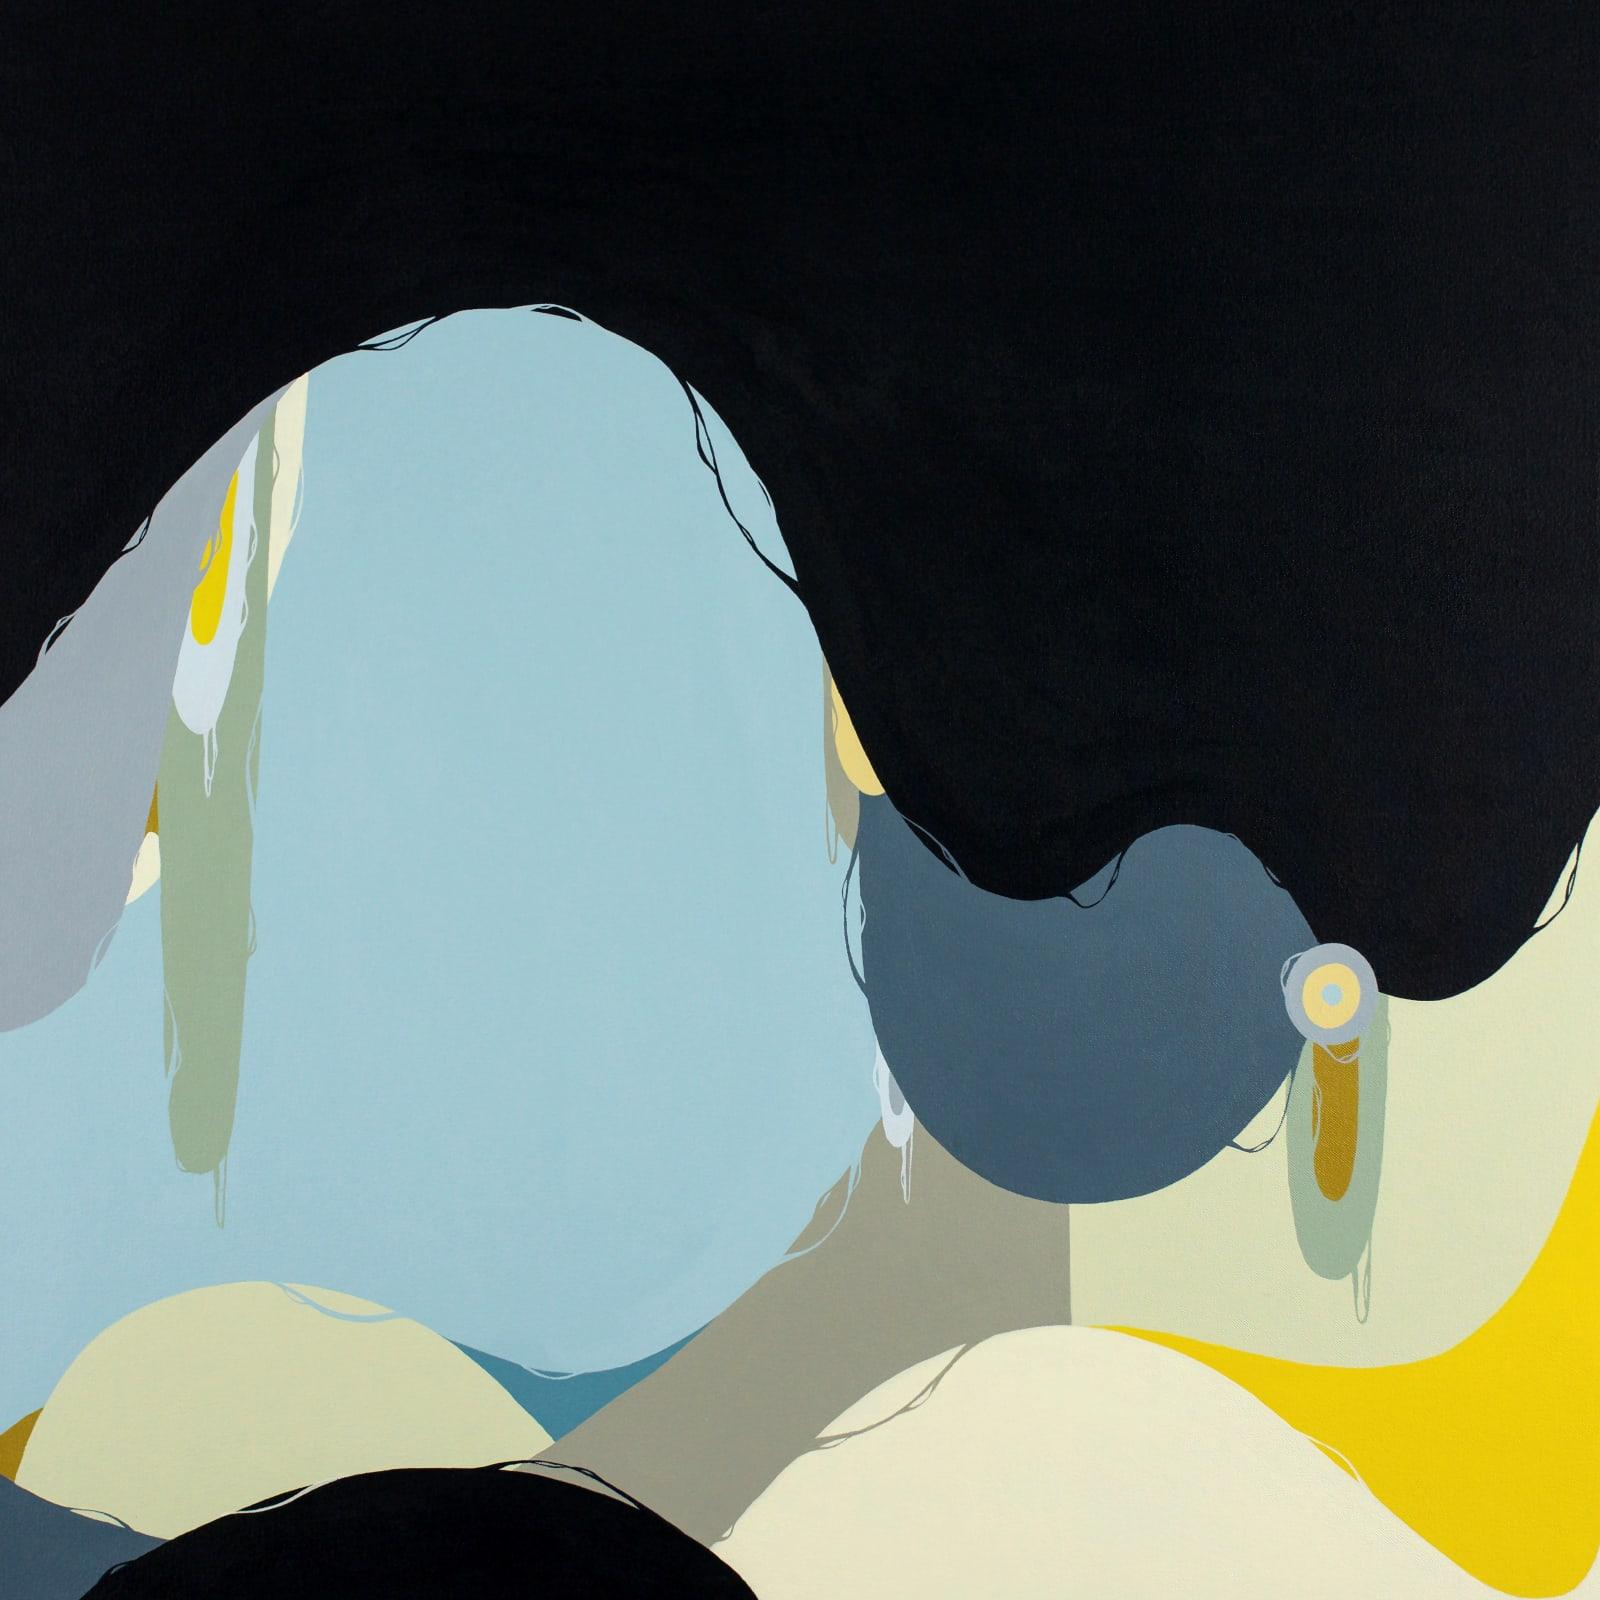 Fernando Andrade Espacio #80, 2021 Acrylic on canvas 30 x 30 x 2 in 76.2 x 76.2 x 5.1 cm